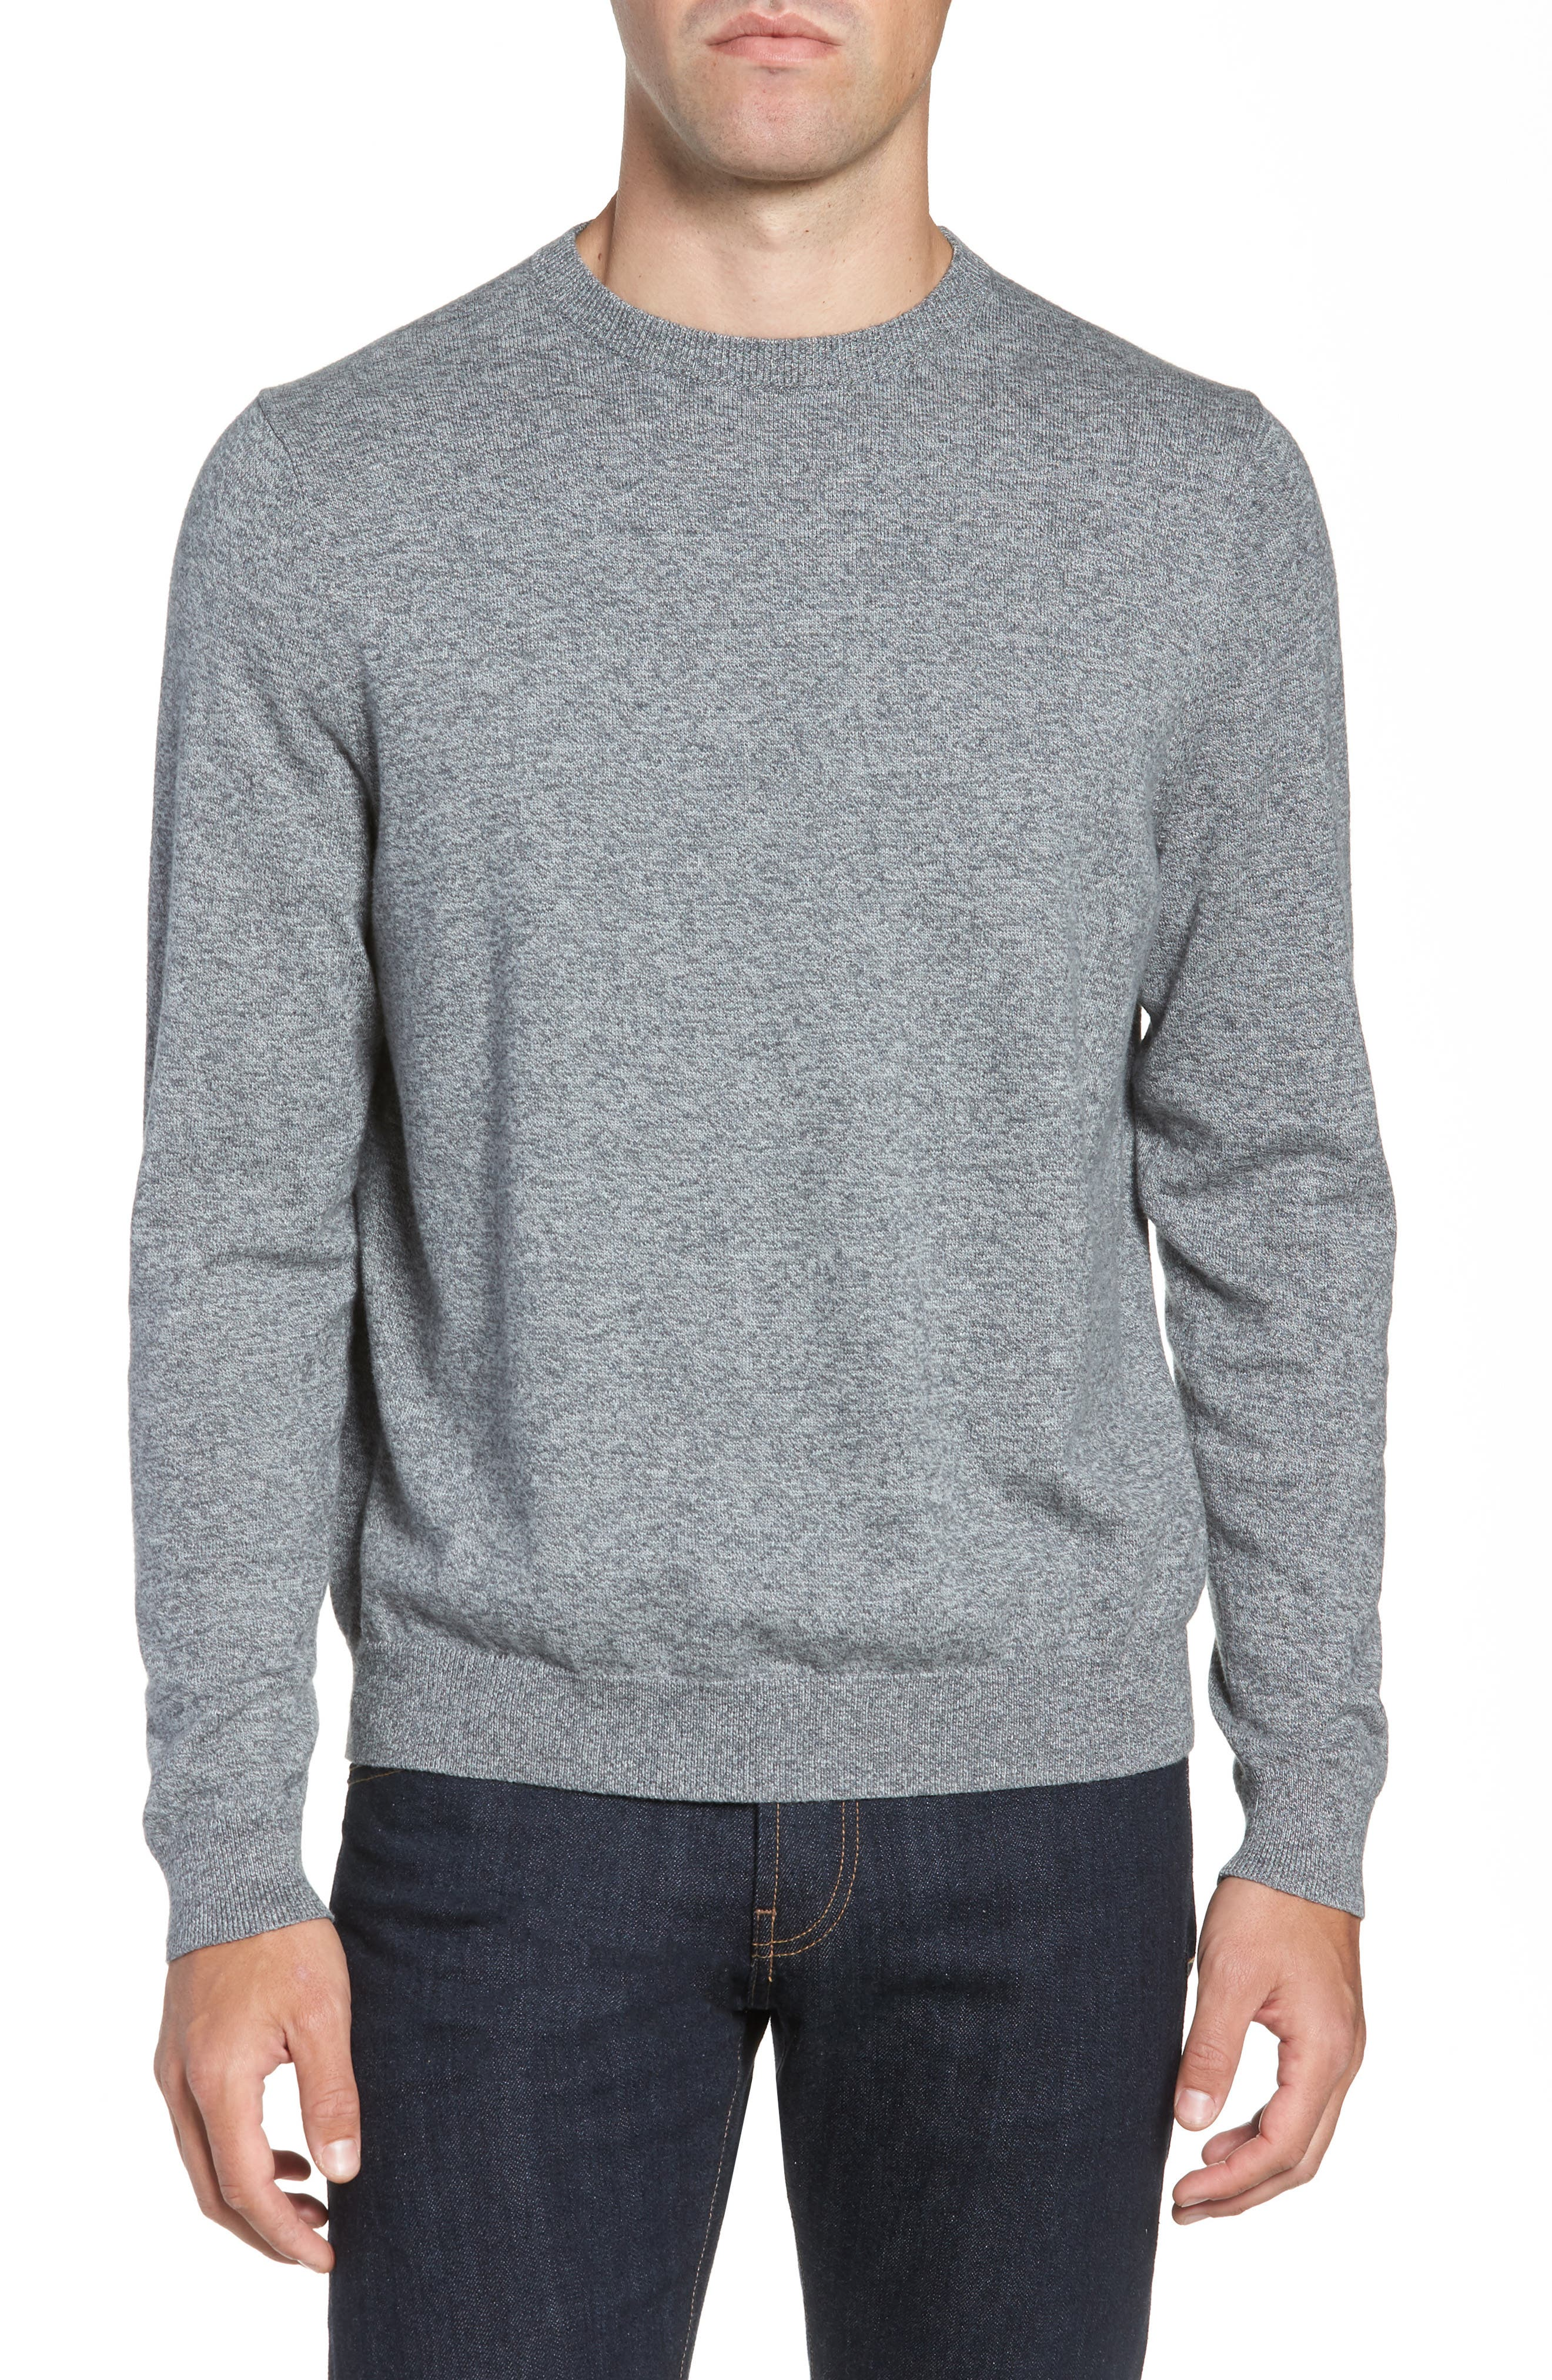 NORDSTROM MEN'S SHOP, Cotton & Cashmere Crewneck Sweater, Main thumbnail 1, color, GREY SHADE MARL